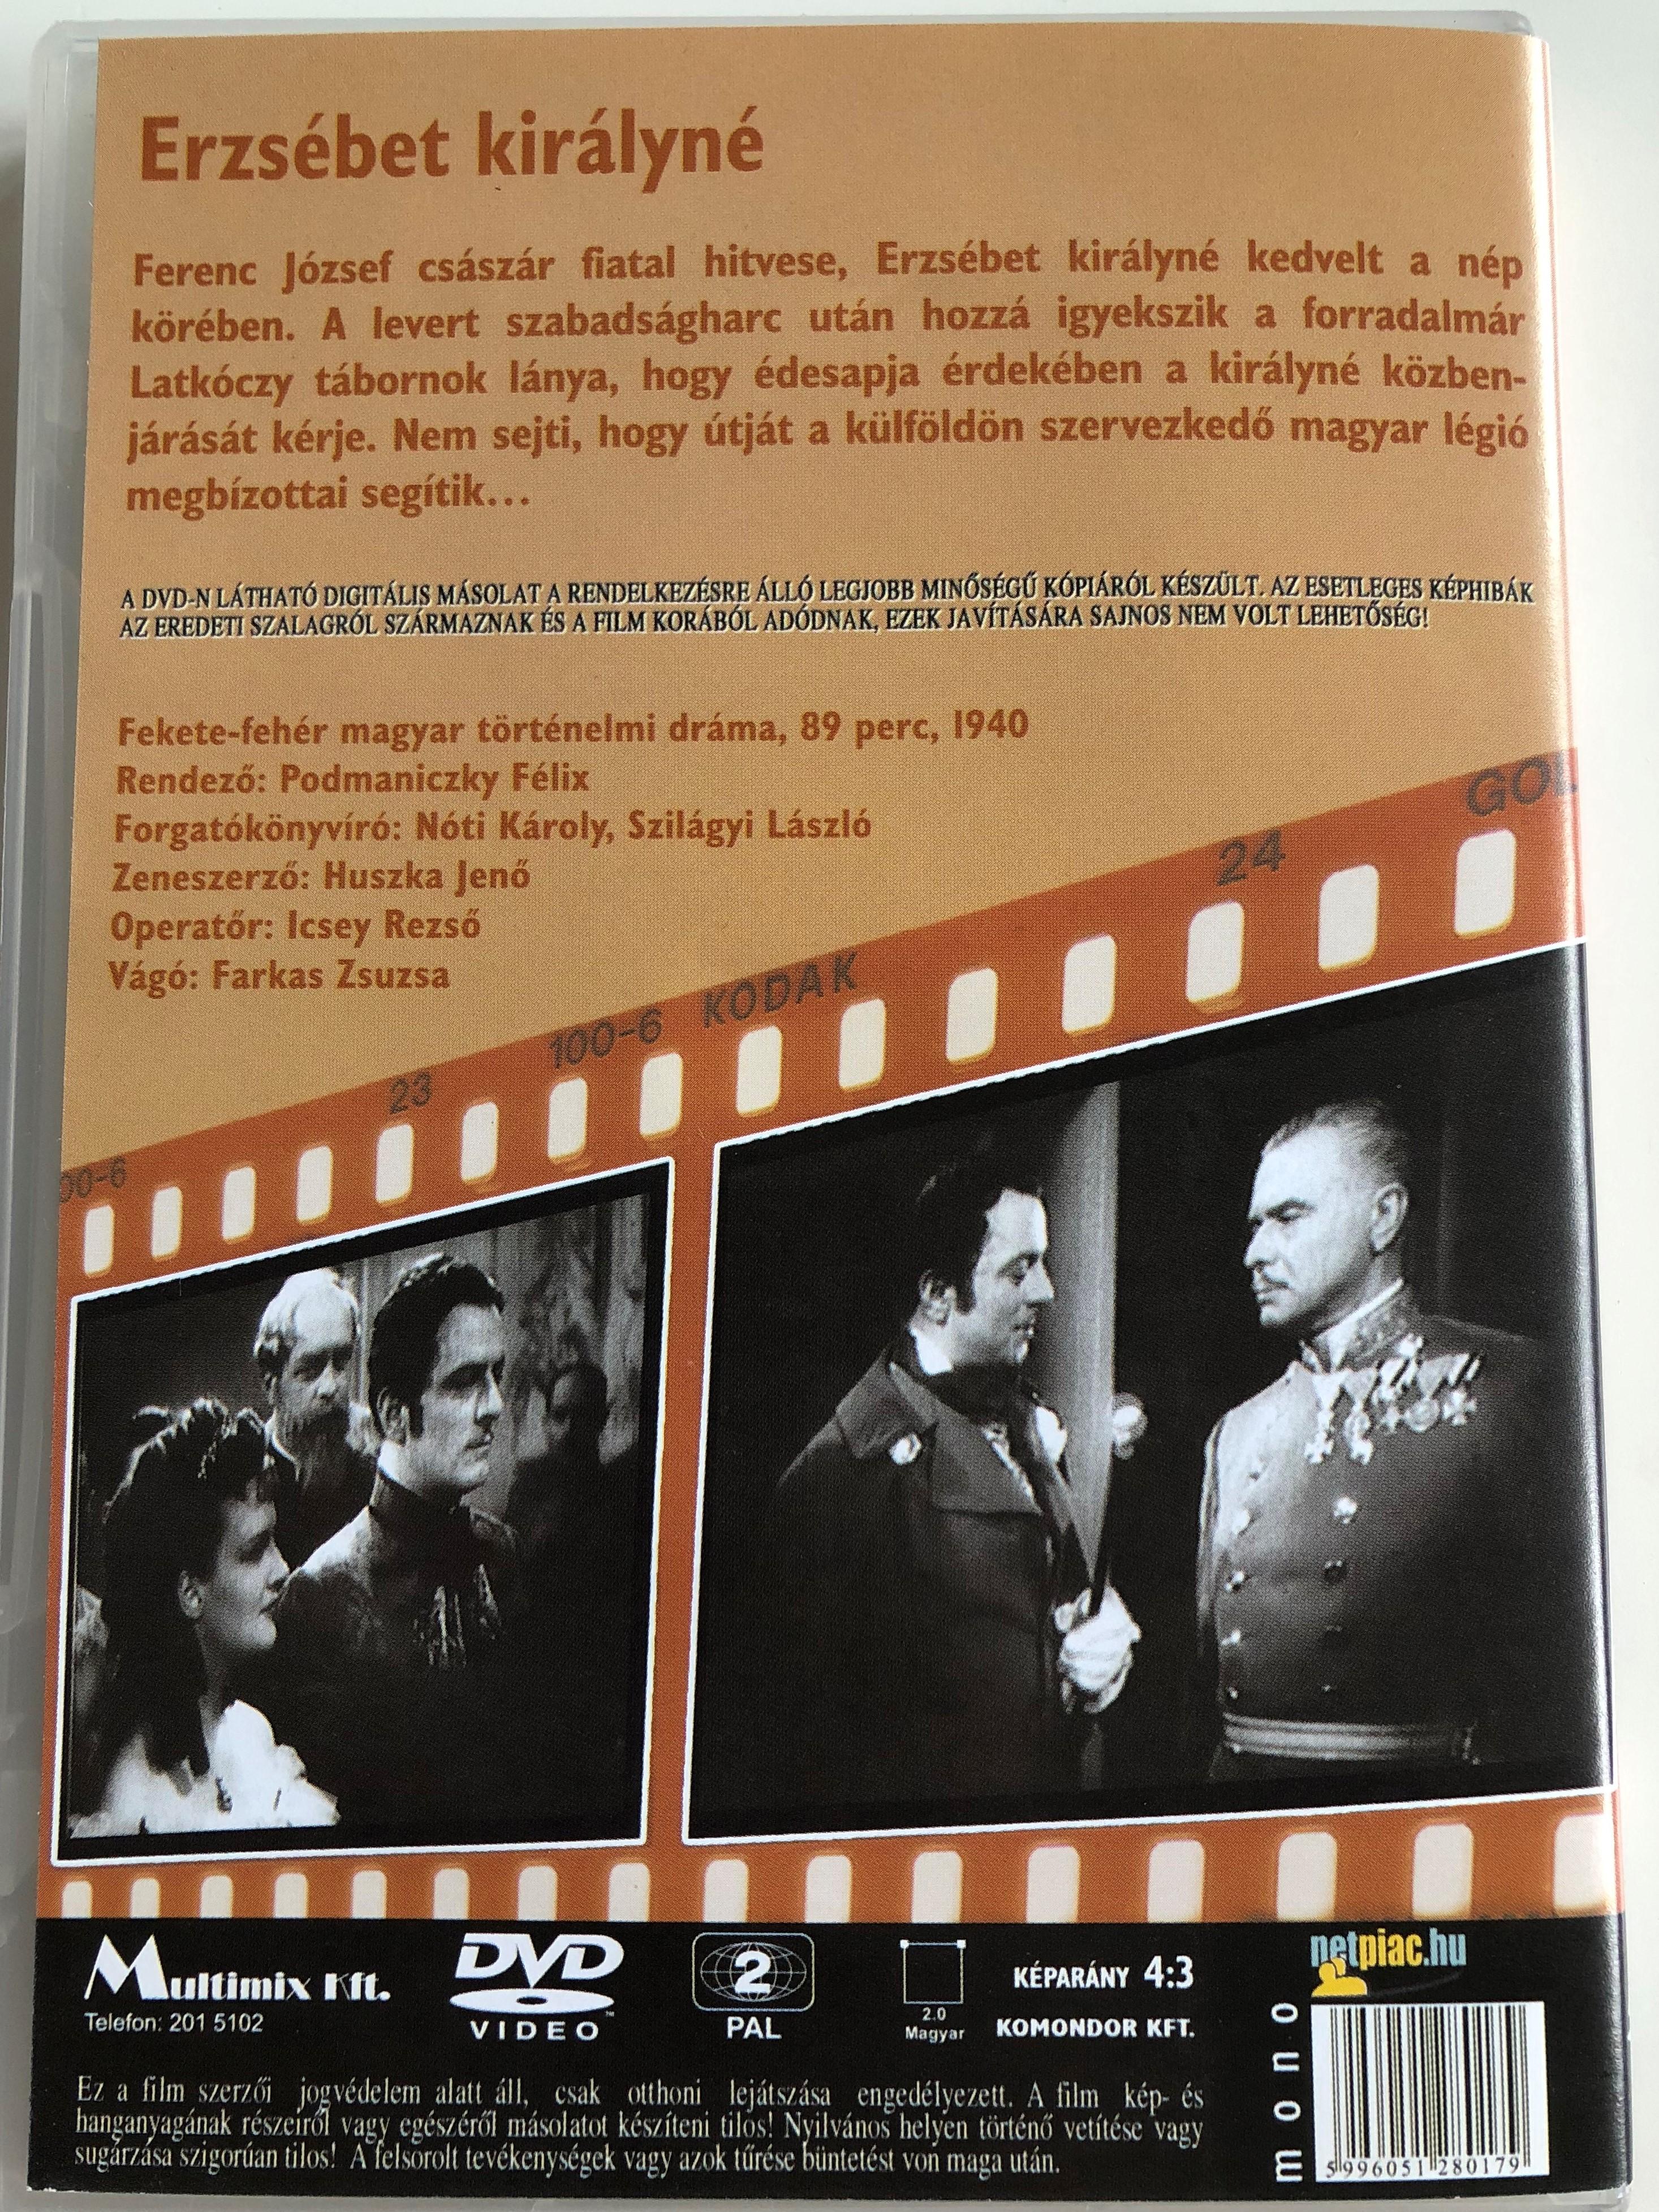 erzs-bet-kir-lyn-dvd-1940-r-gi-magyar-filmek-2.jpg